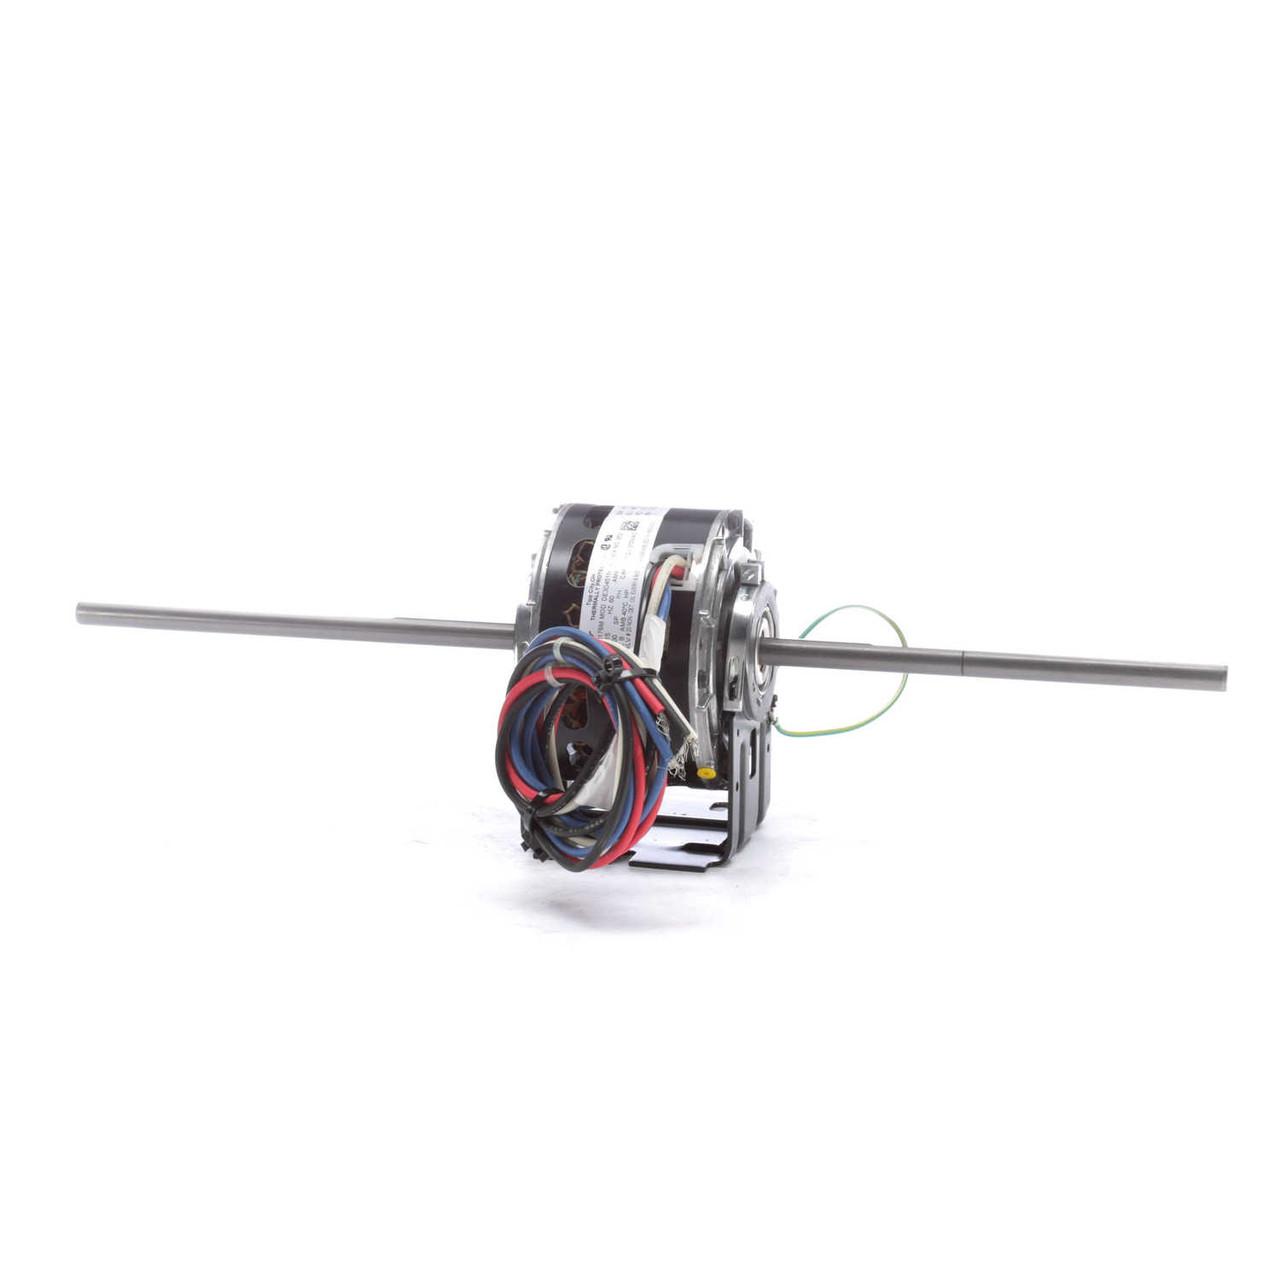 Trane HVAC Electric Motor (X70500149-03-7) 1/30 hp 1100